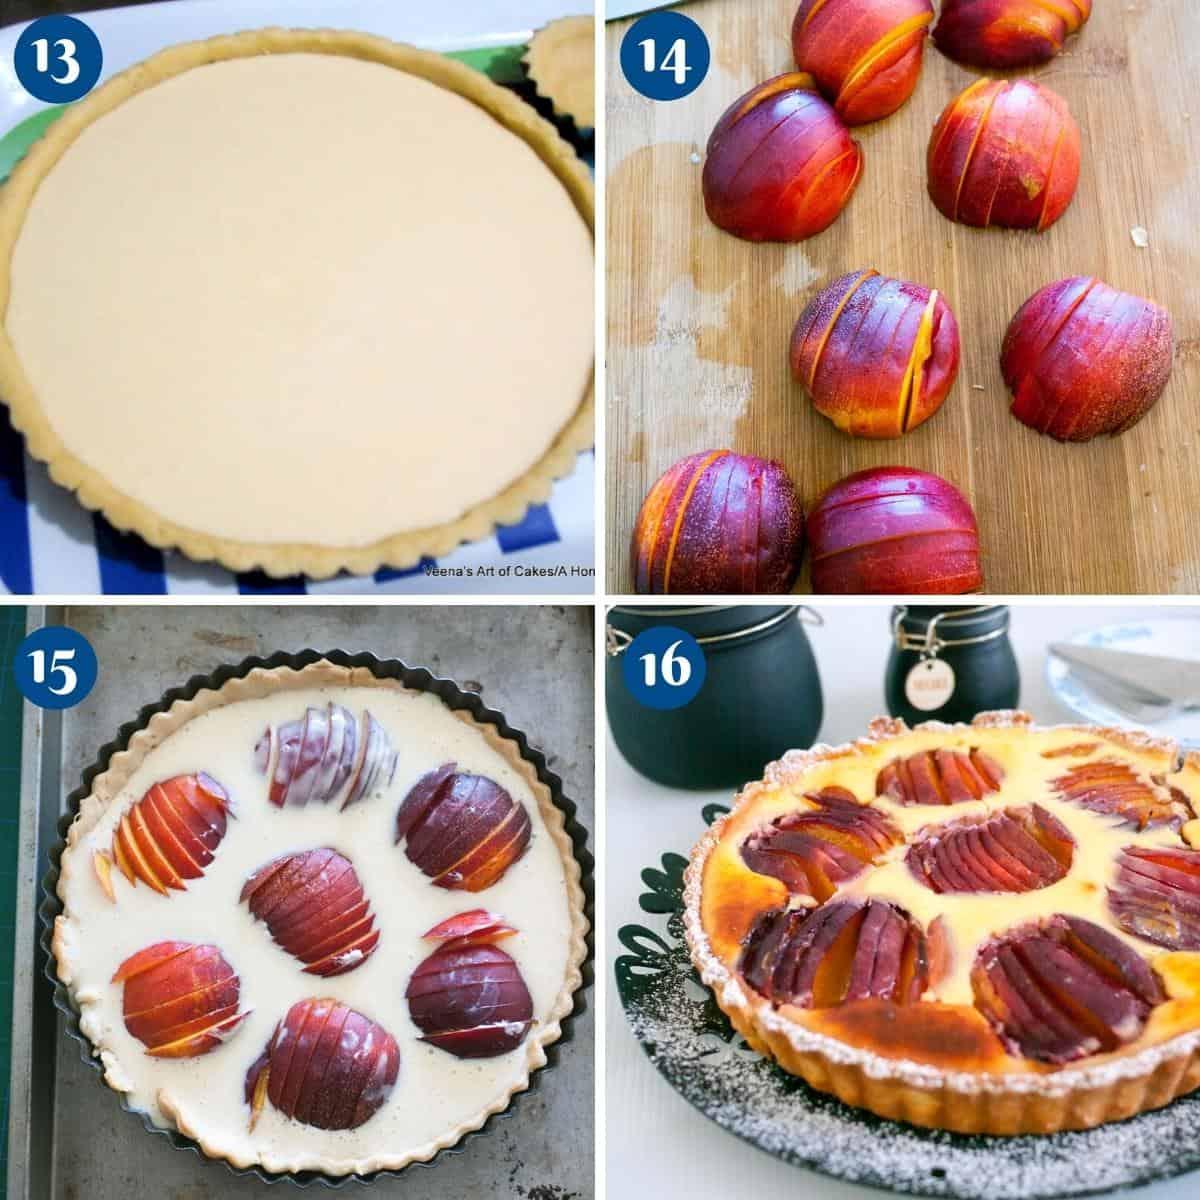 Progress pictures baking the nectarine tart.